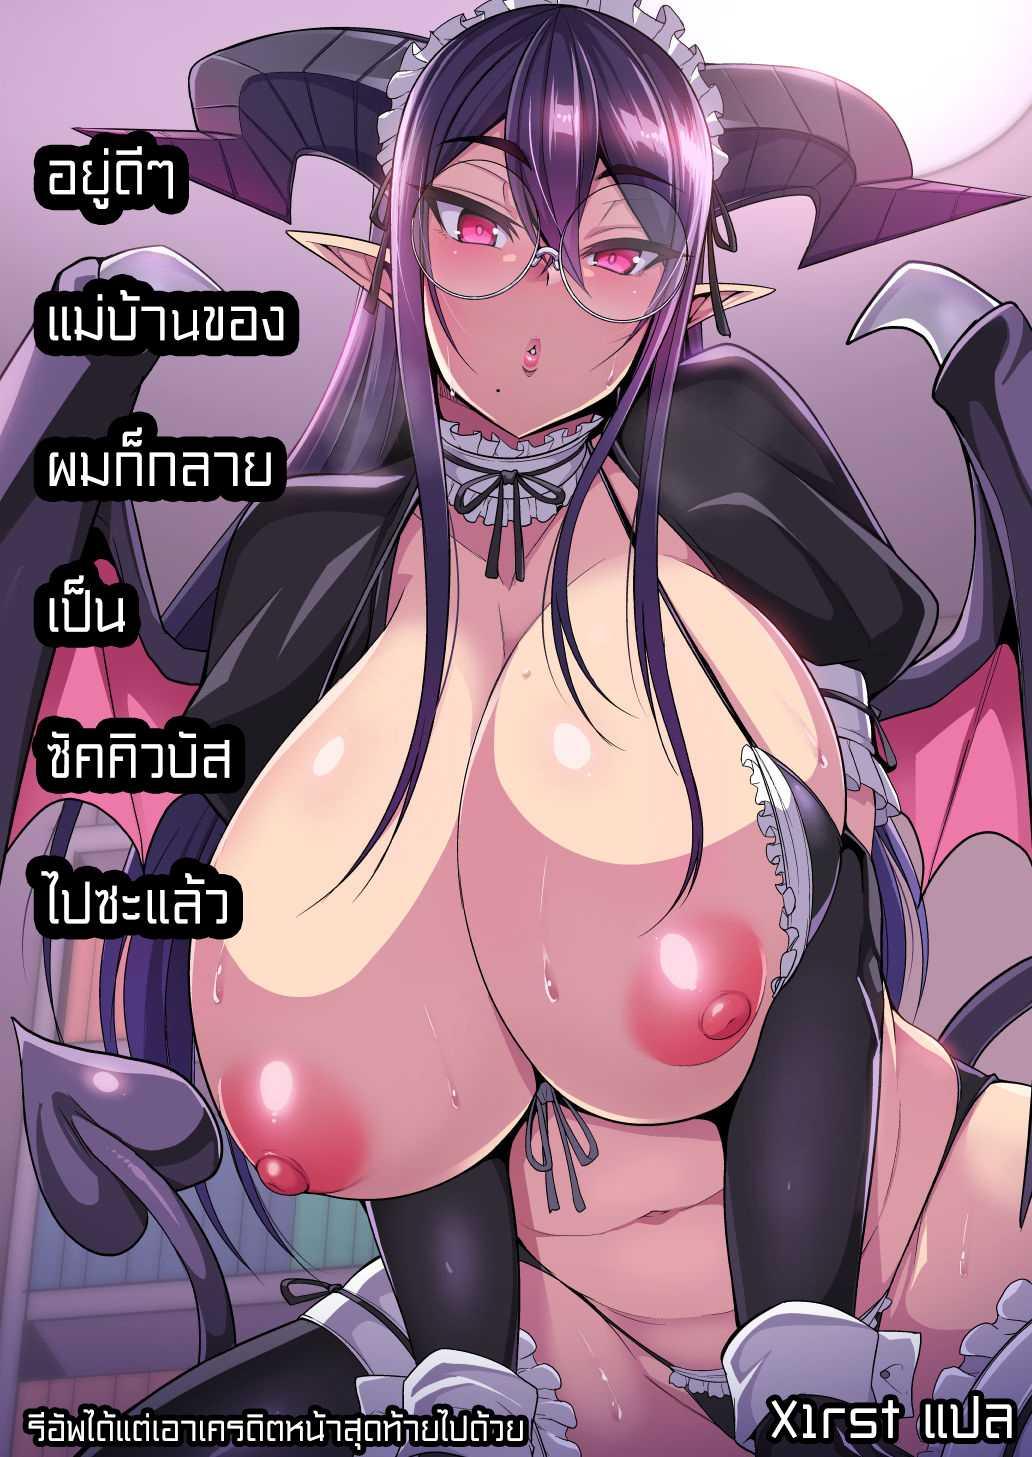 houkago-inokorigumi-nishida-megane-succubus-maid-no-mayuri-san